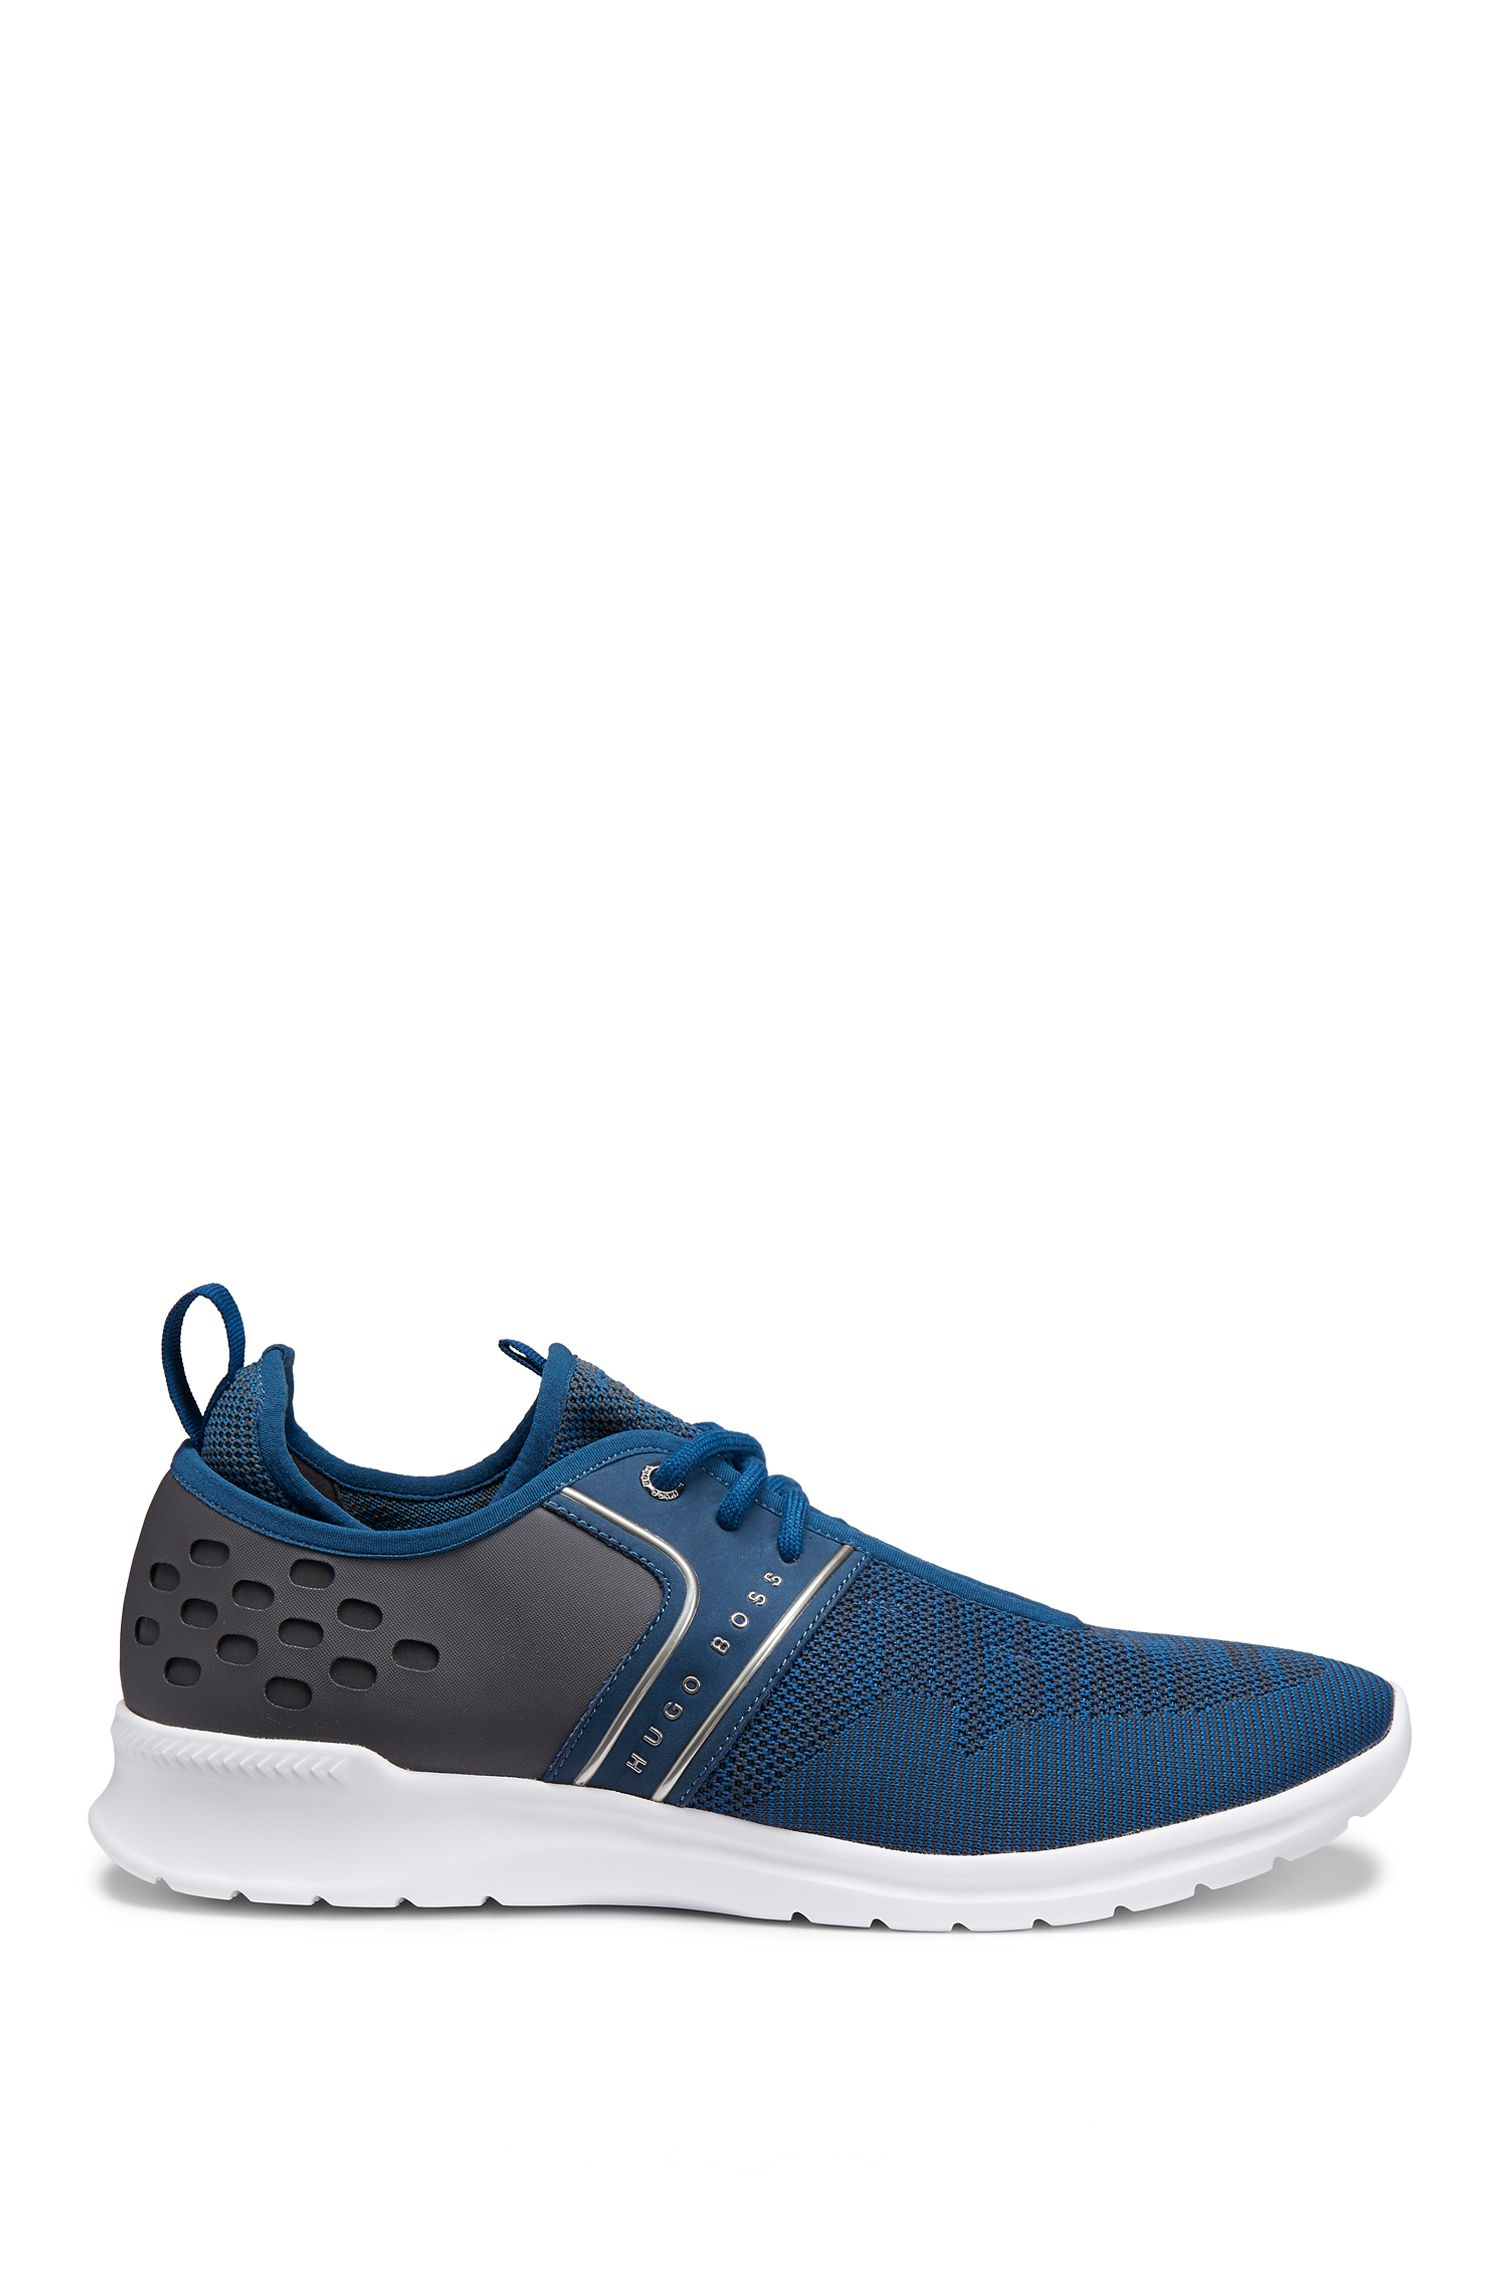 Nylon Sneakers | Extreme Runn Sykn, Open Blue